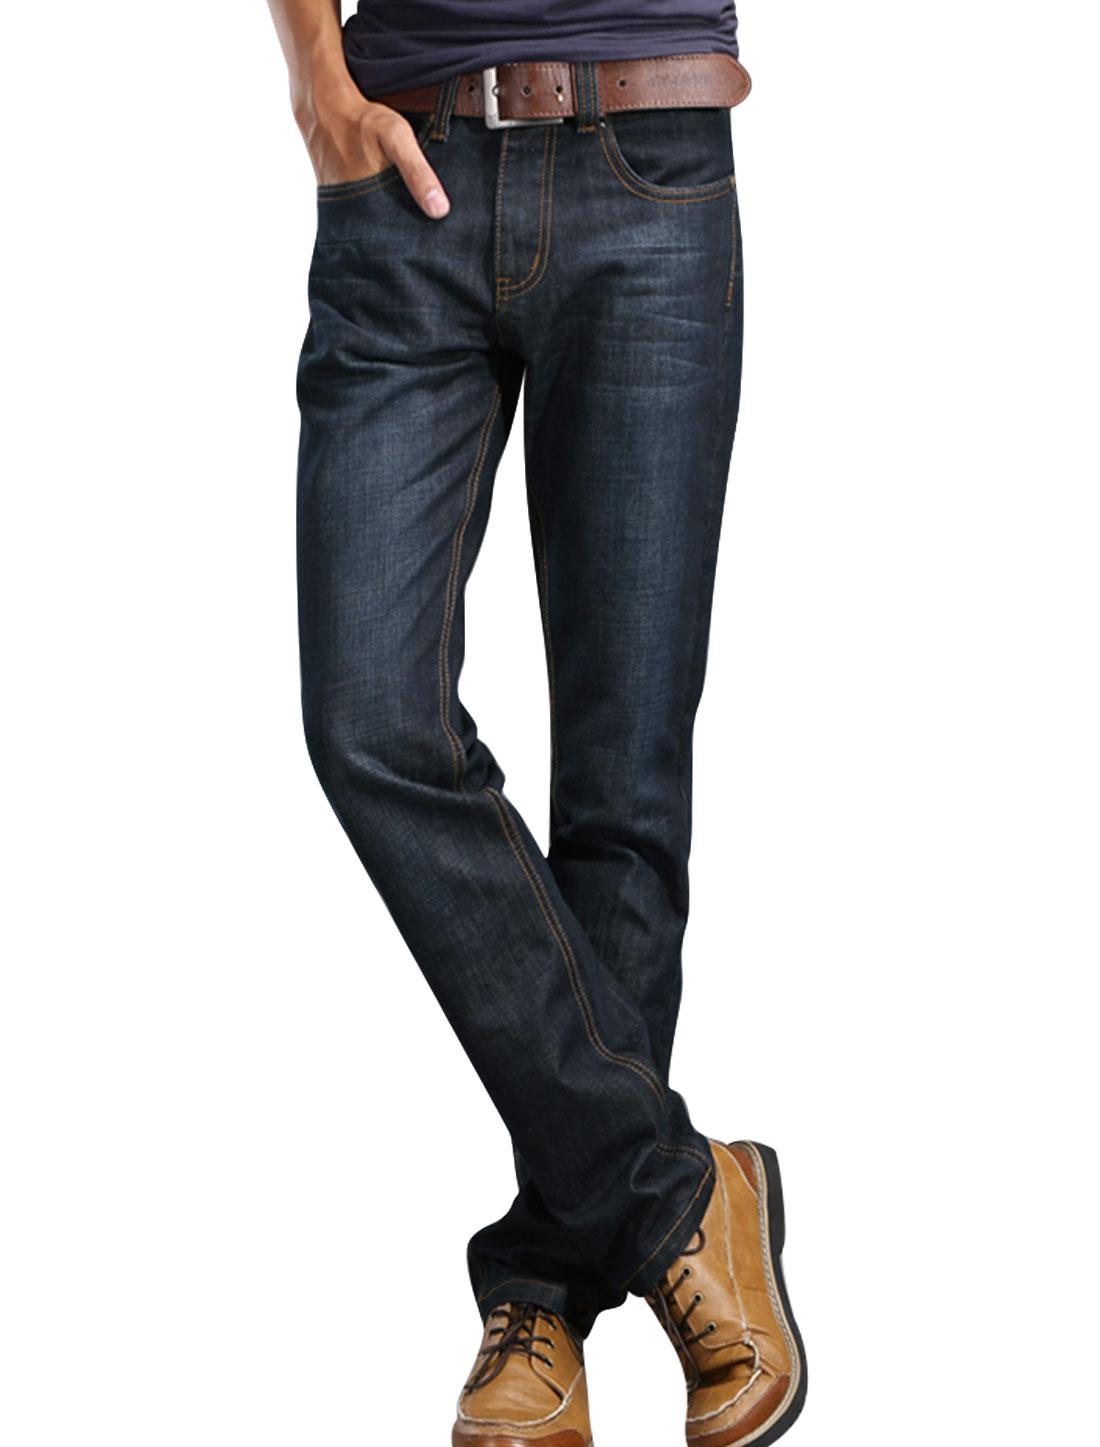 Men Black Mid Waist Zipper Closure Belt Loop Button Down Hip Pockets Jeans W32